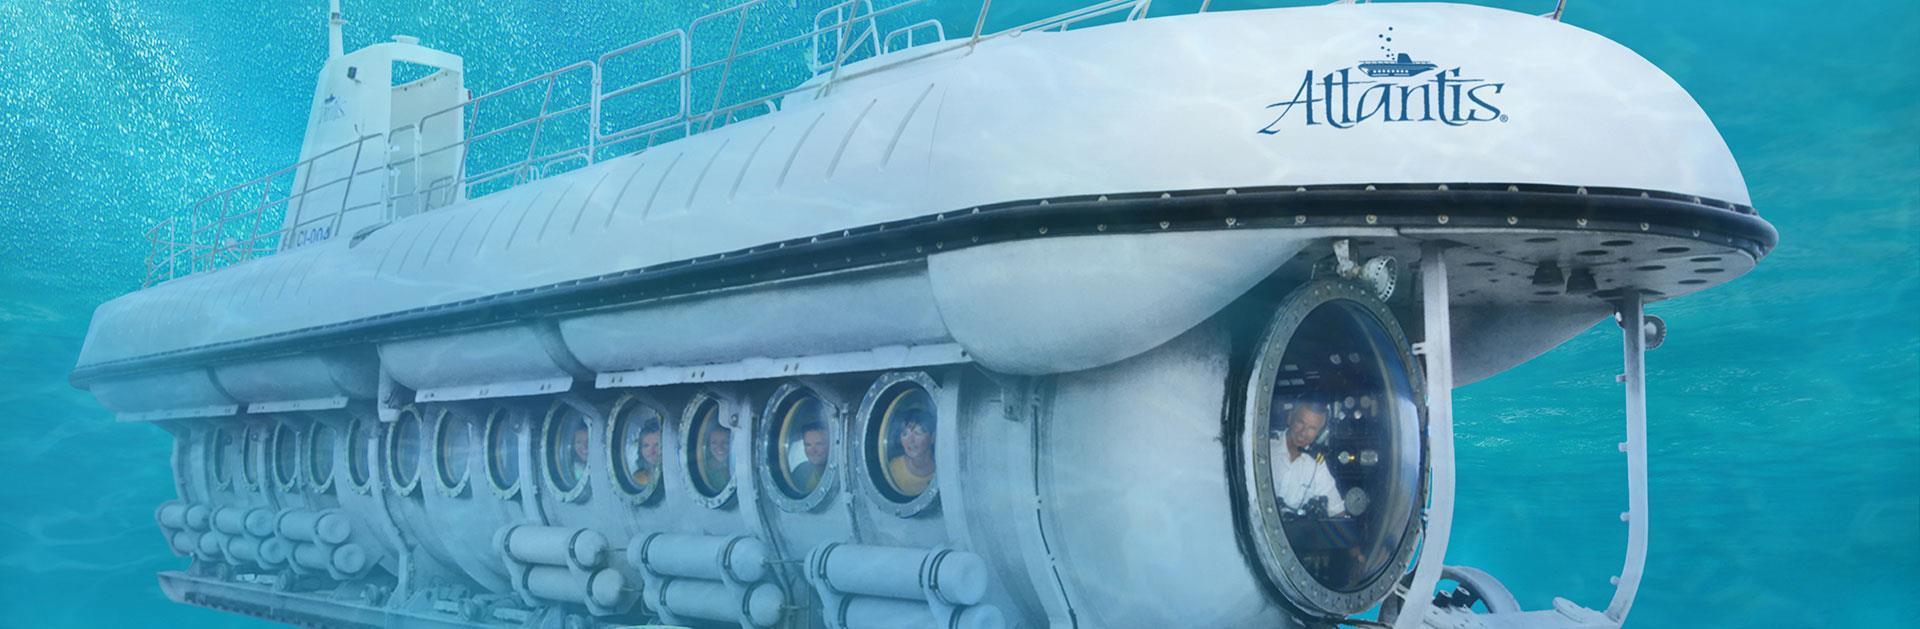 Atlantis Submarines Barbados For a Glimpse of Underwater Caribbean